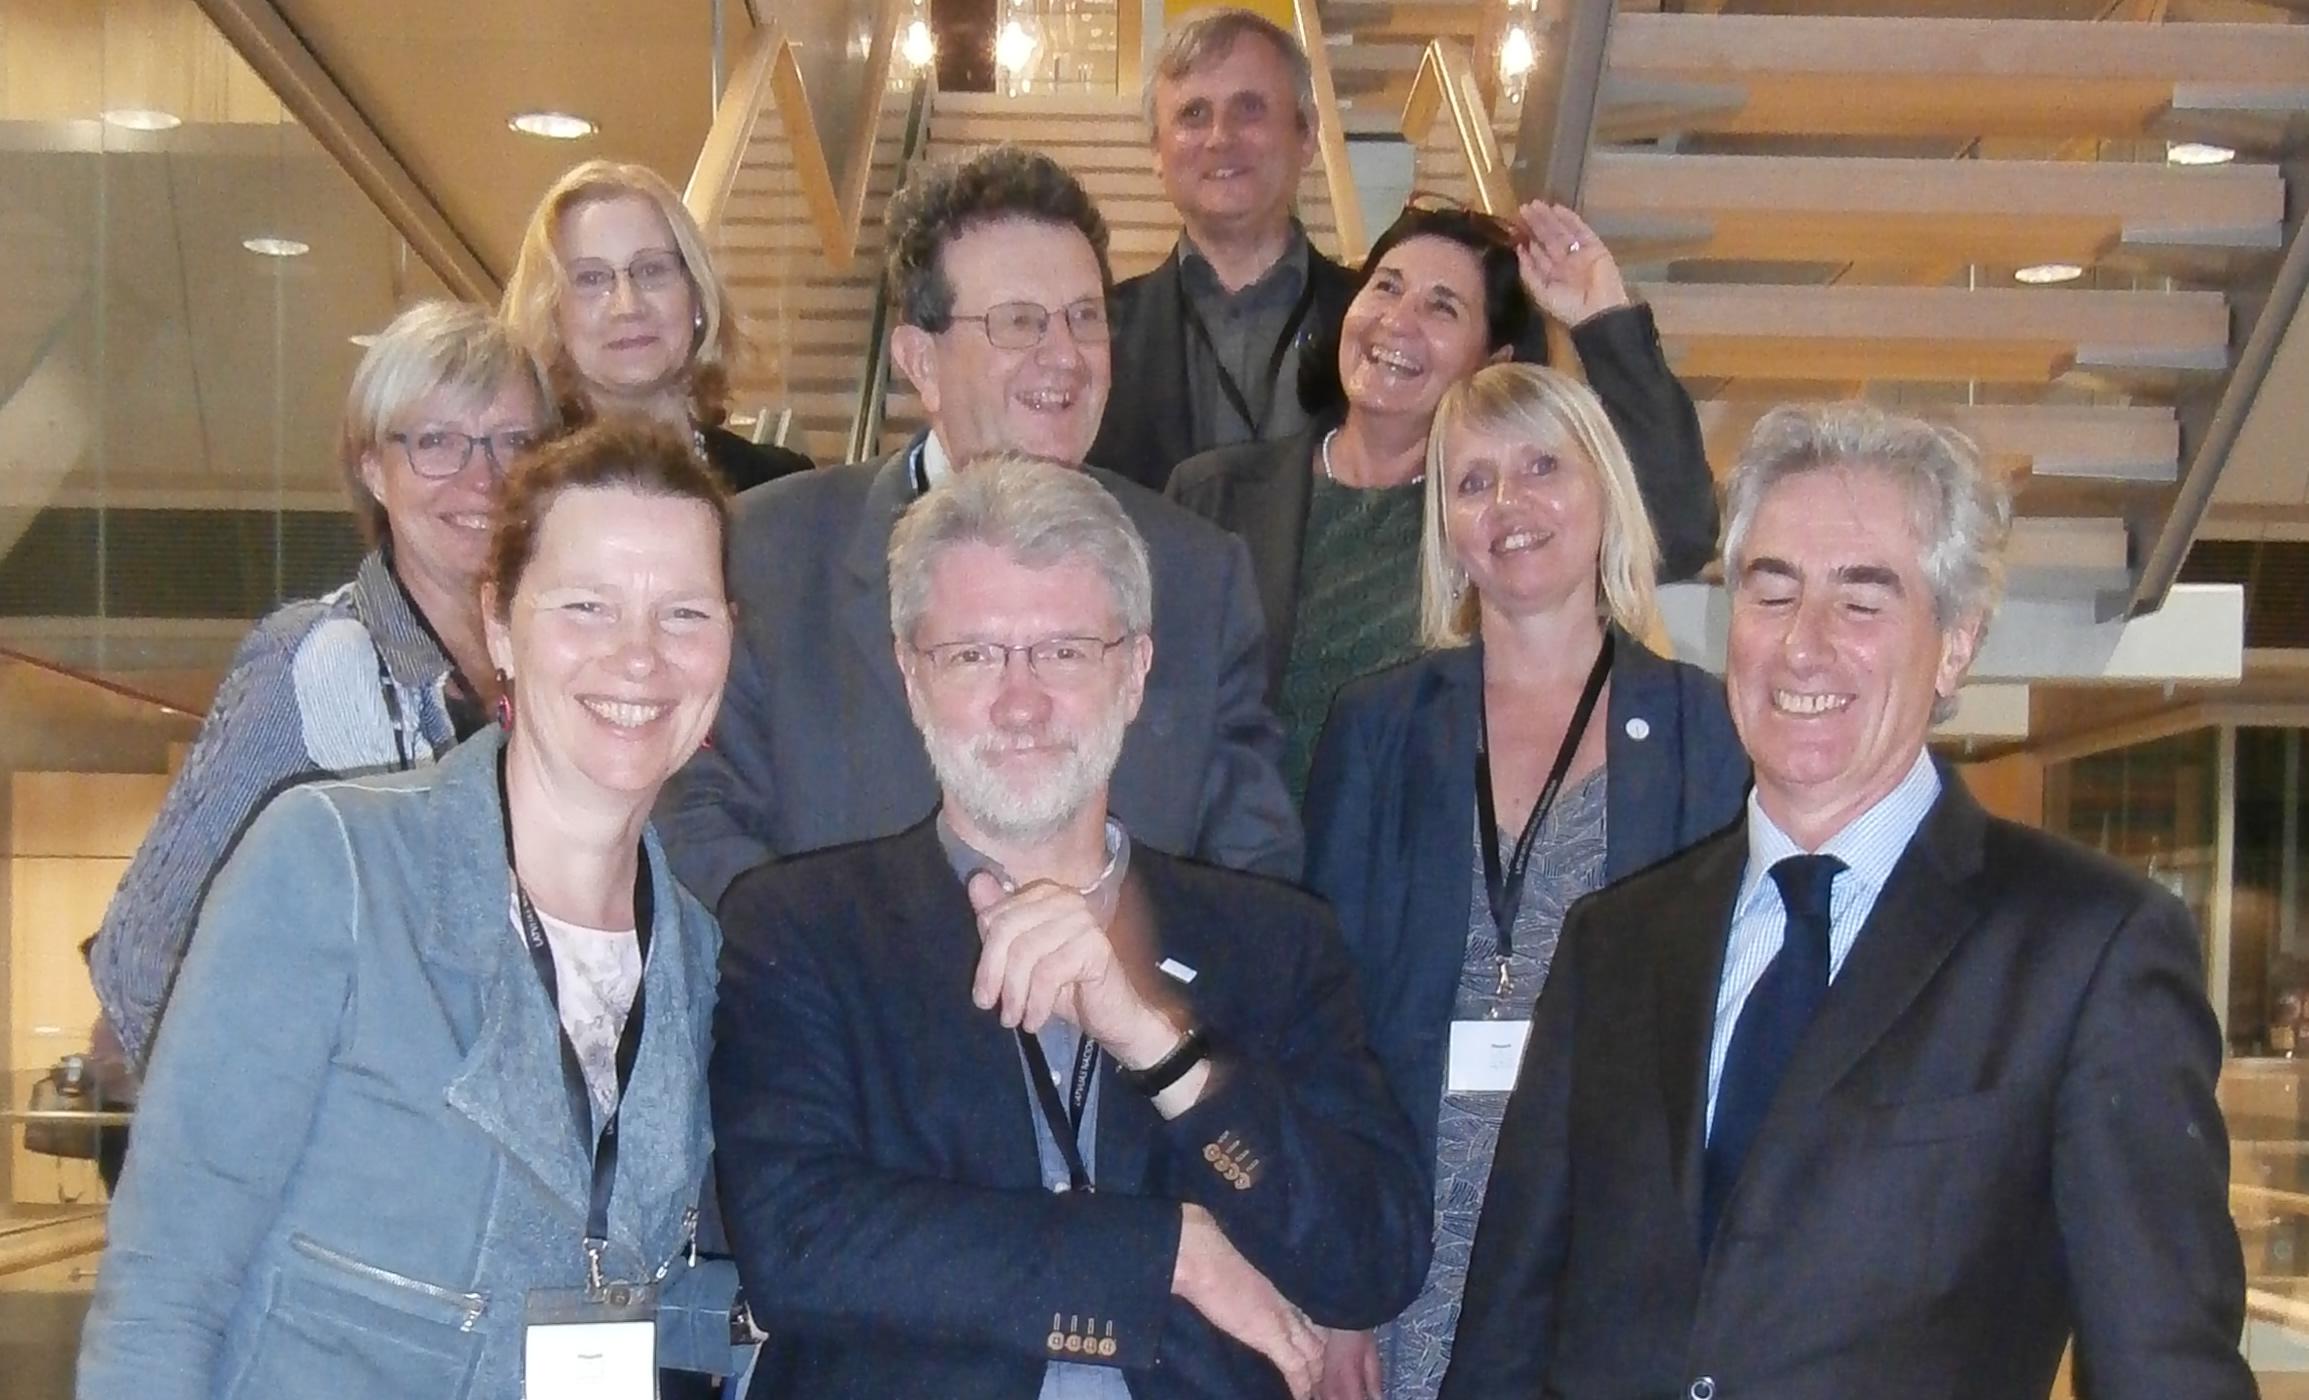 Outgoing Executive Committee EBLIDA